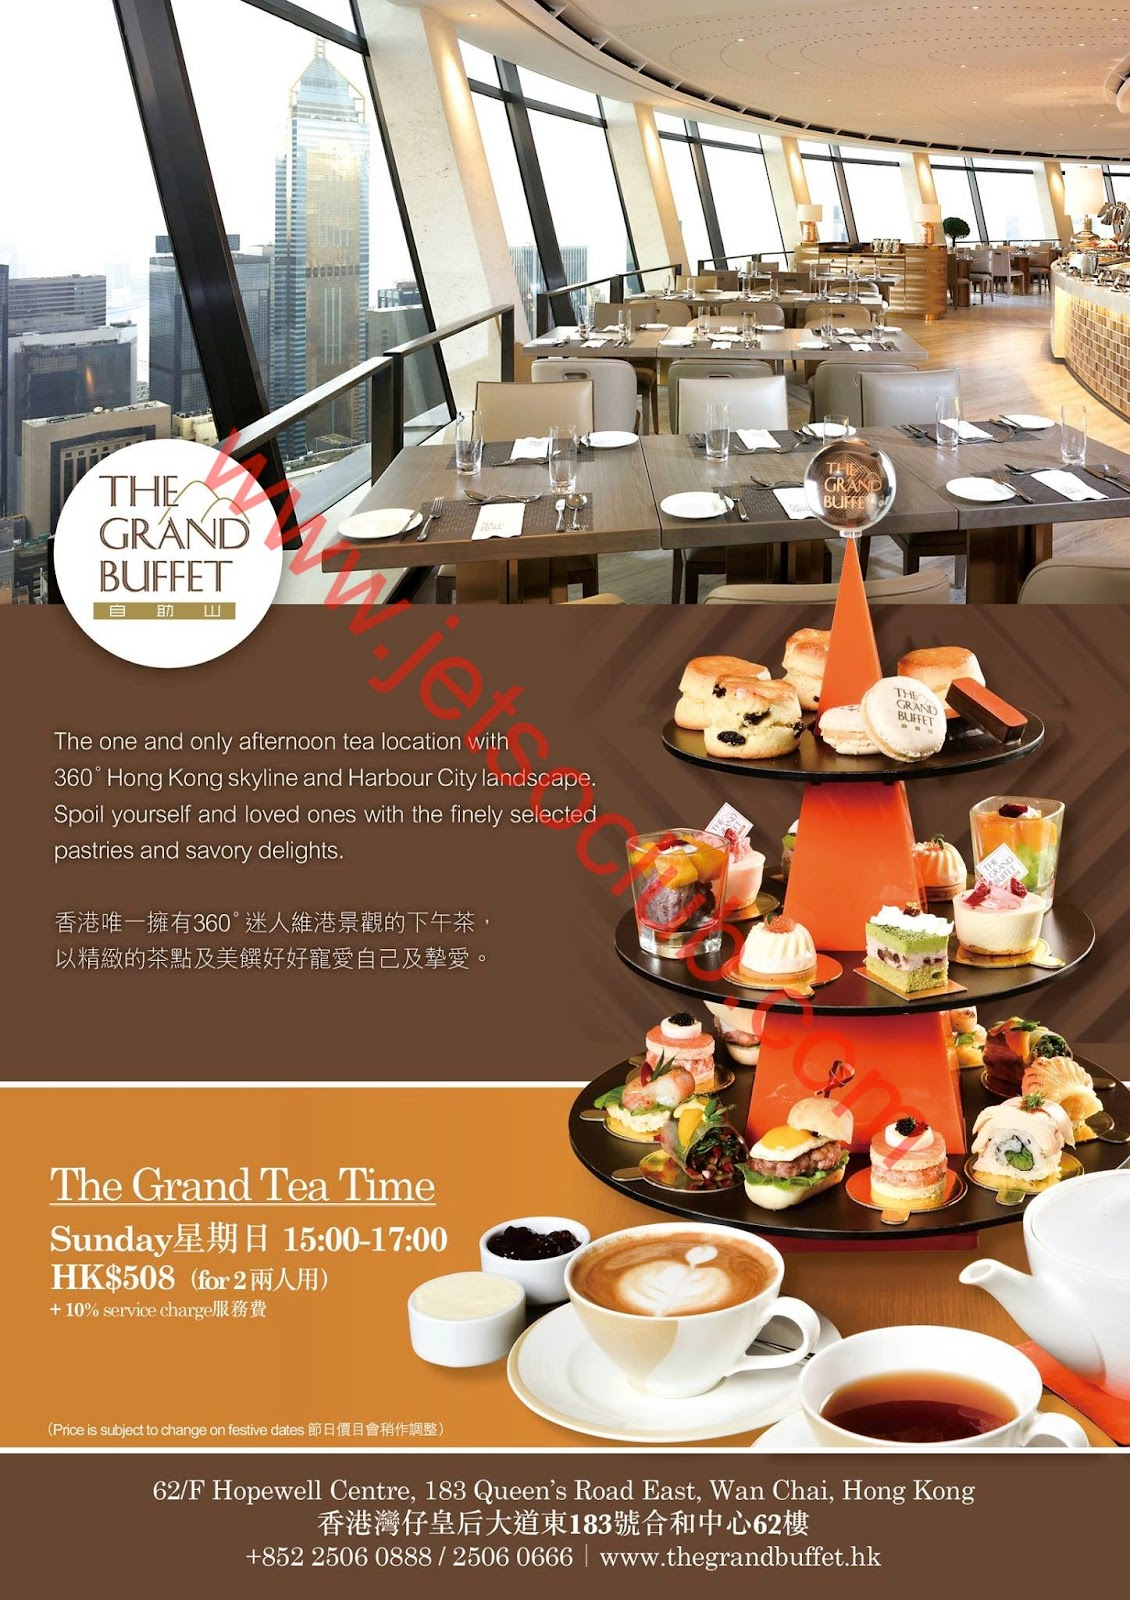 The Grand Buffet「自助山」:推出全新「The Grand Tea Time」(3/4起)/ 4月及5月份自助餐價目及時間表 ( Jetso Club 著數 ...